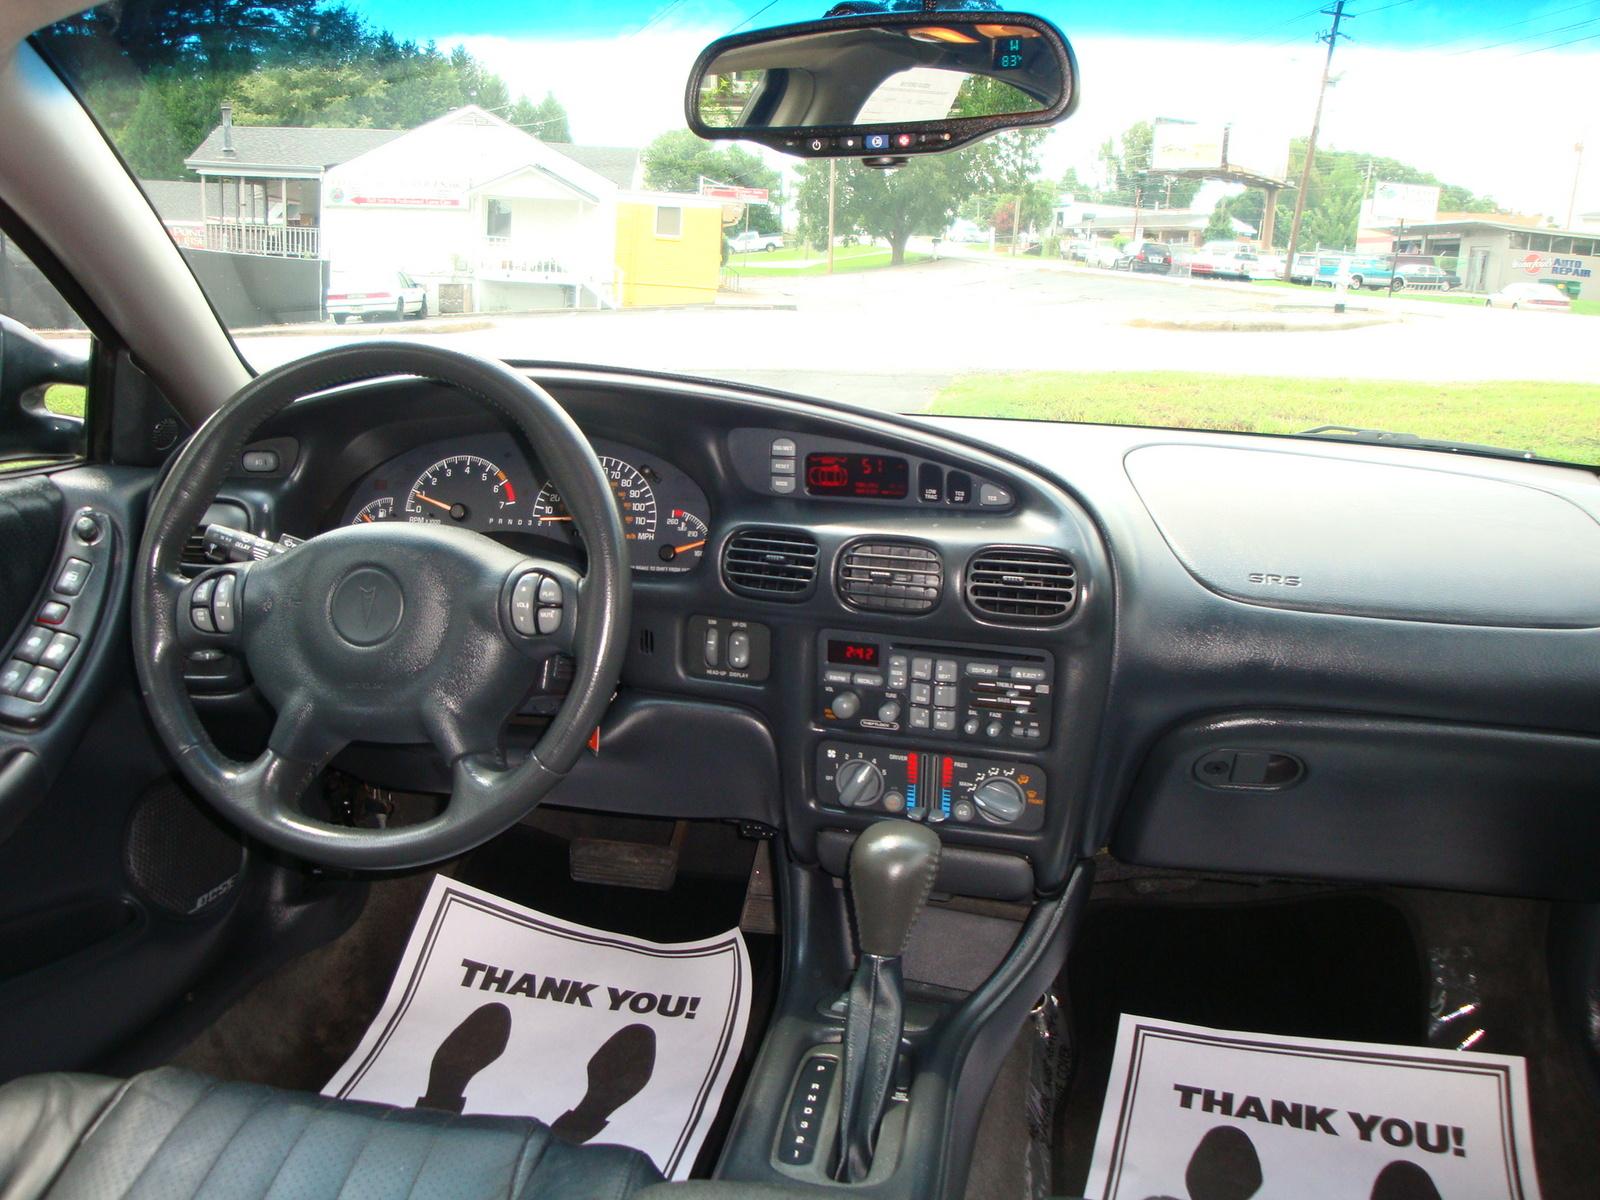 2000 Gtp Fuse Diagram Content Resource Of Wiring Grand Prix Box 2004 Pontiac Free Gt